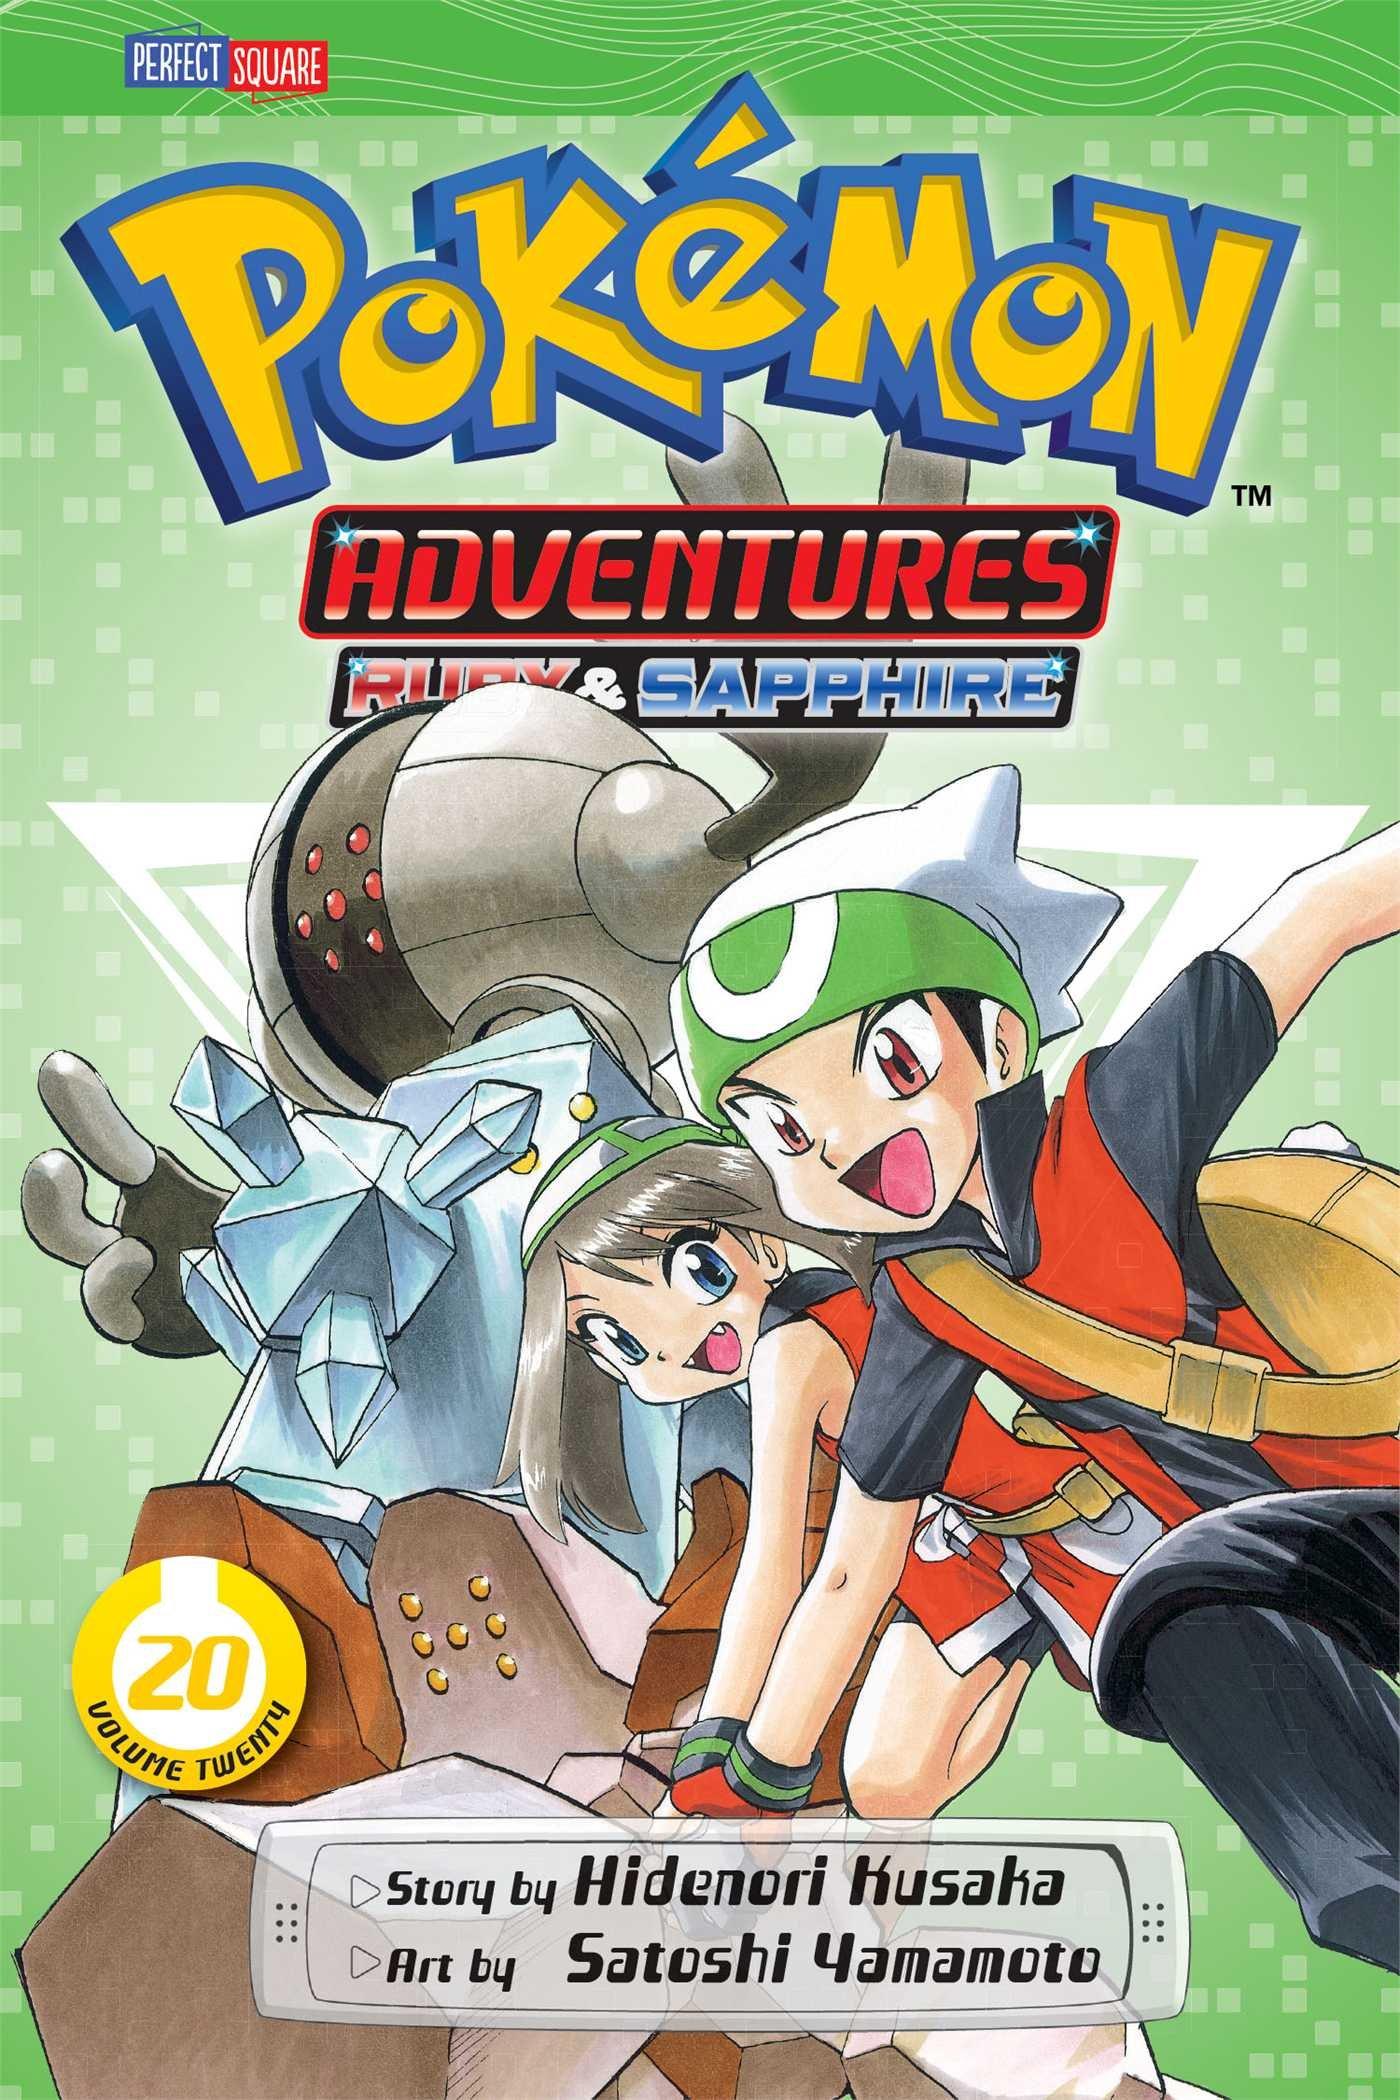 Download Pokémon Adventures (Ruby and Sapphire), Vol. 20 (Pokemon) pdf epub